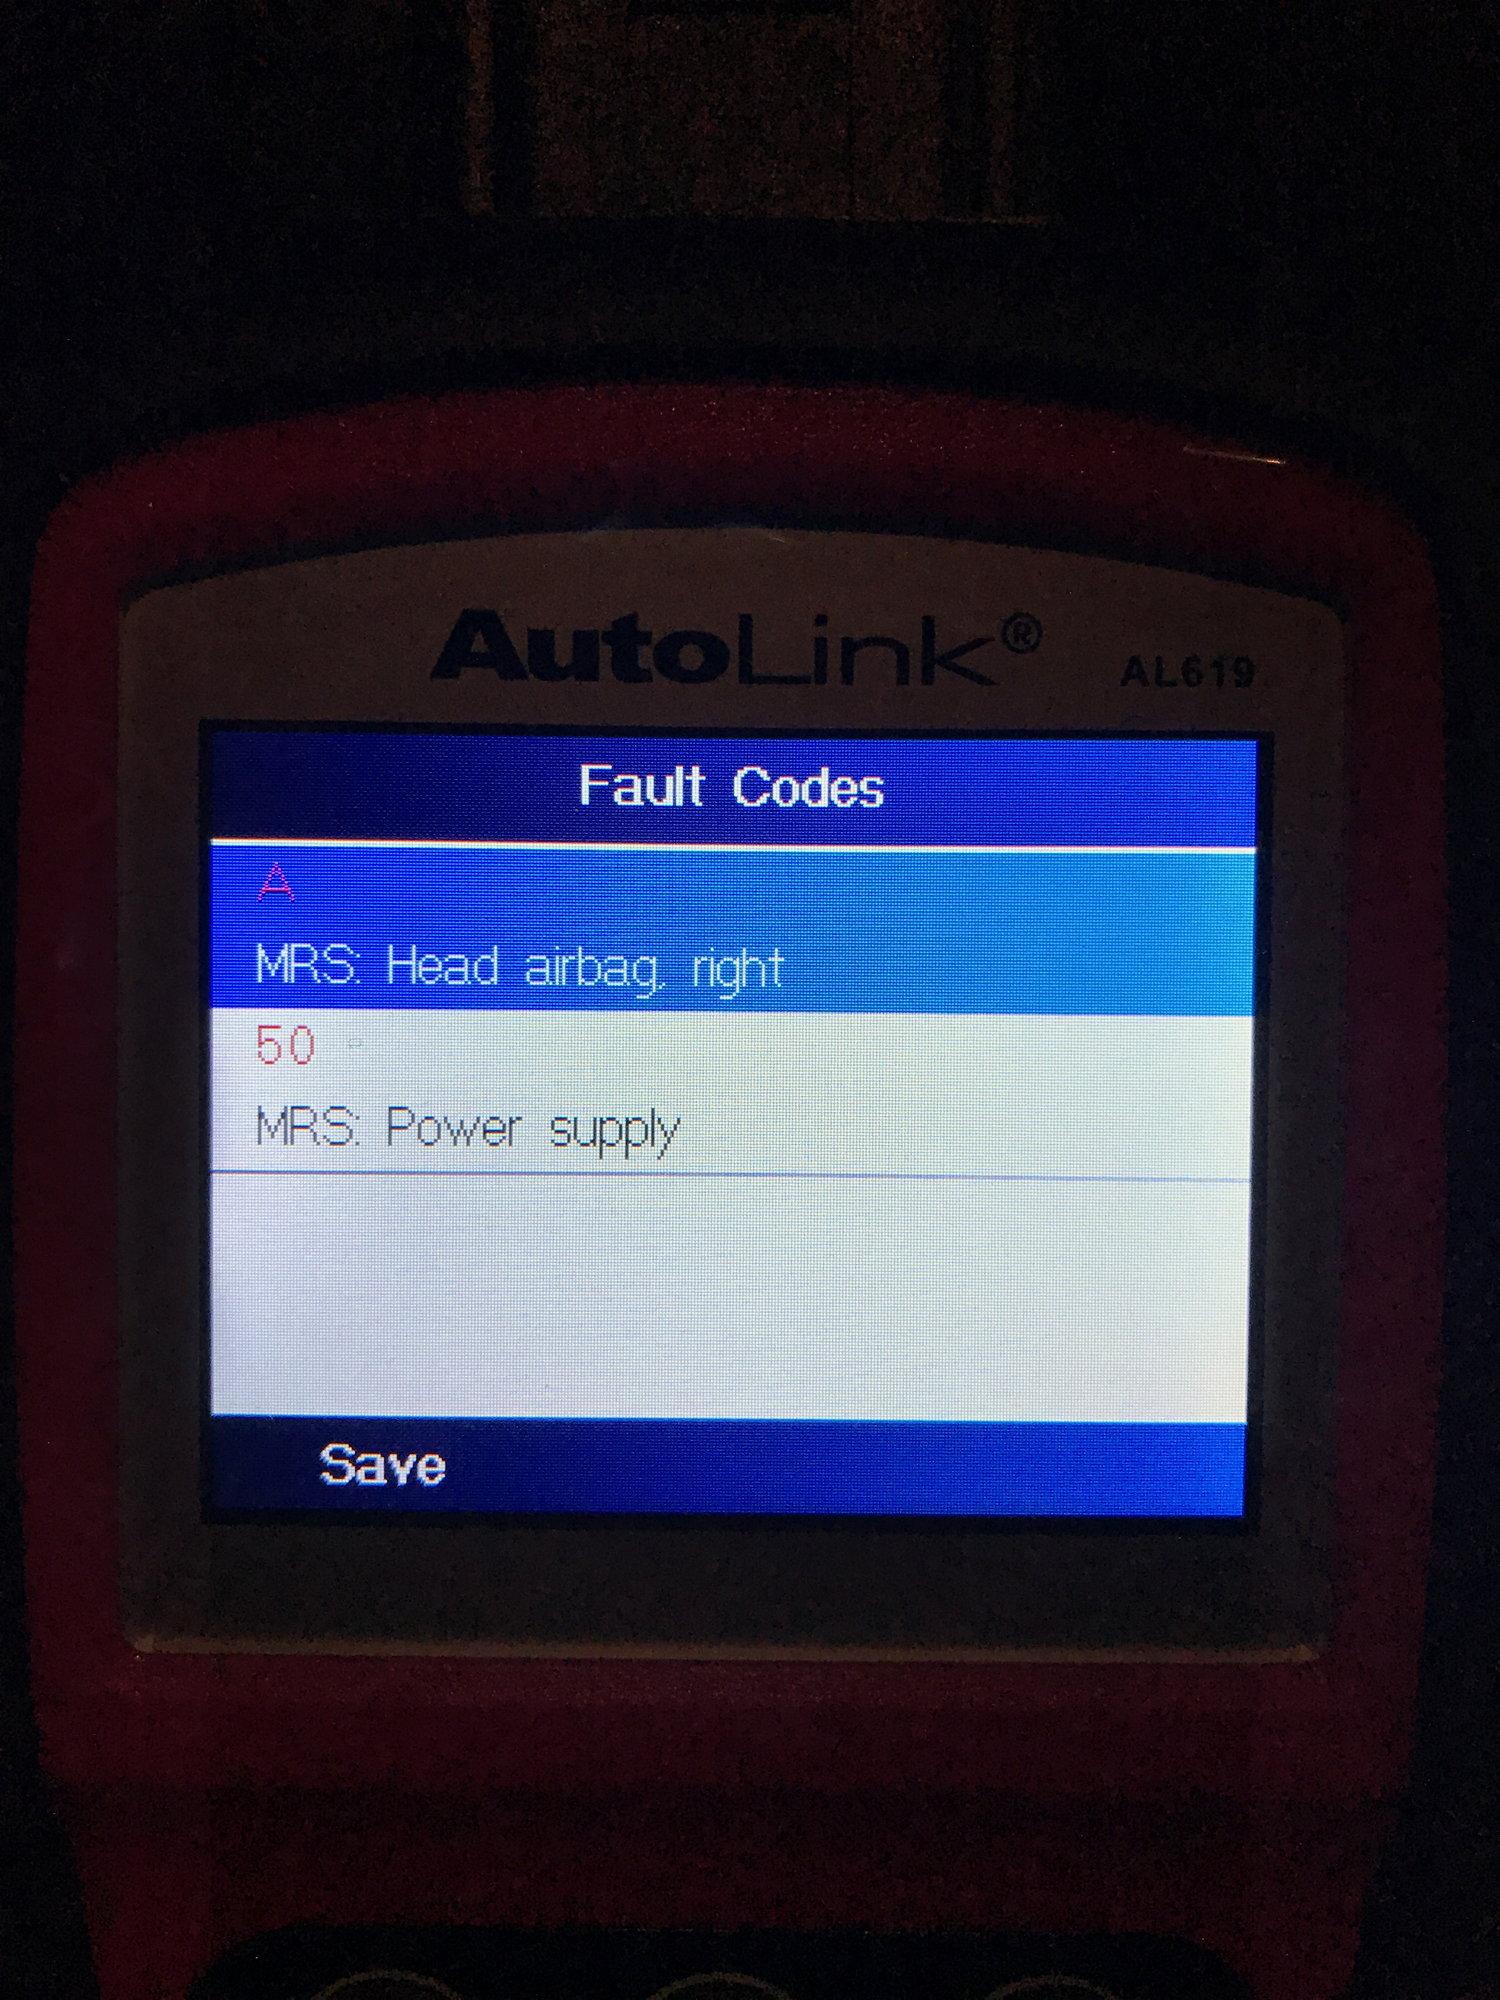 Reset airbag warning light? - North American Motoring